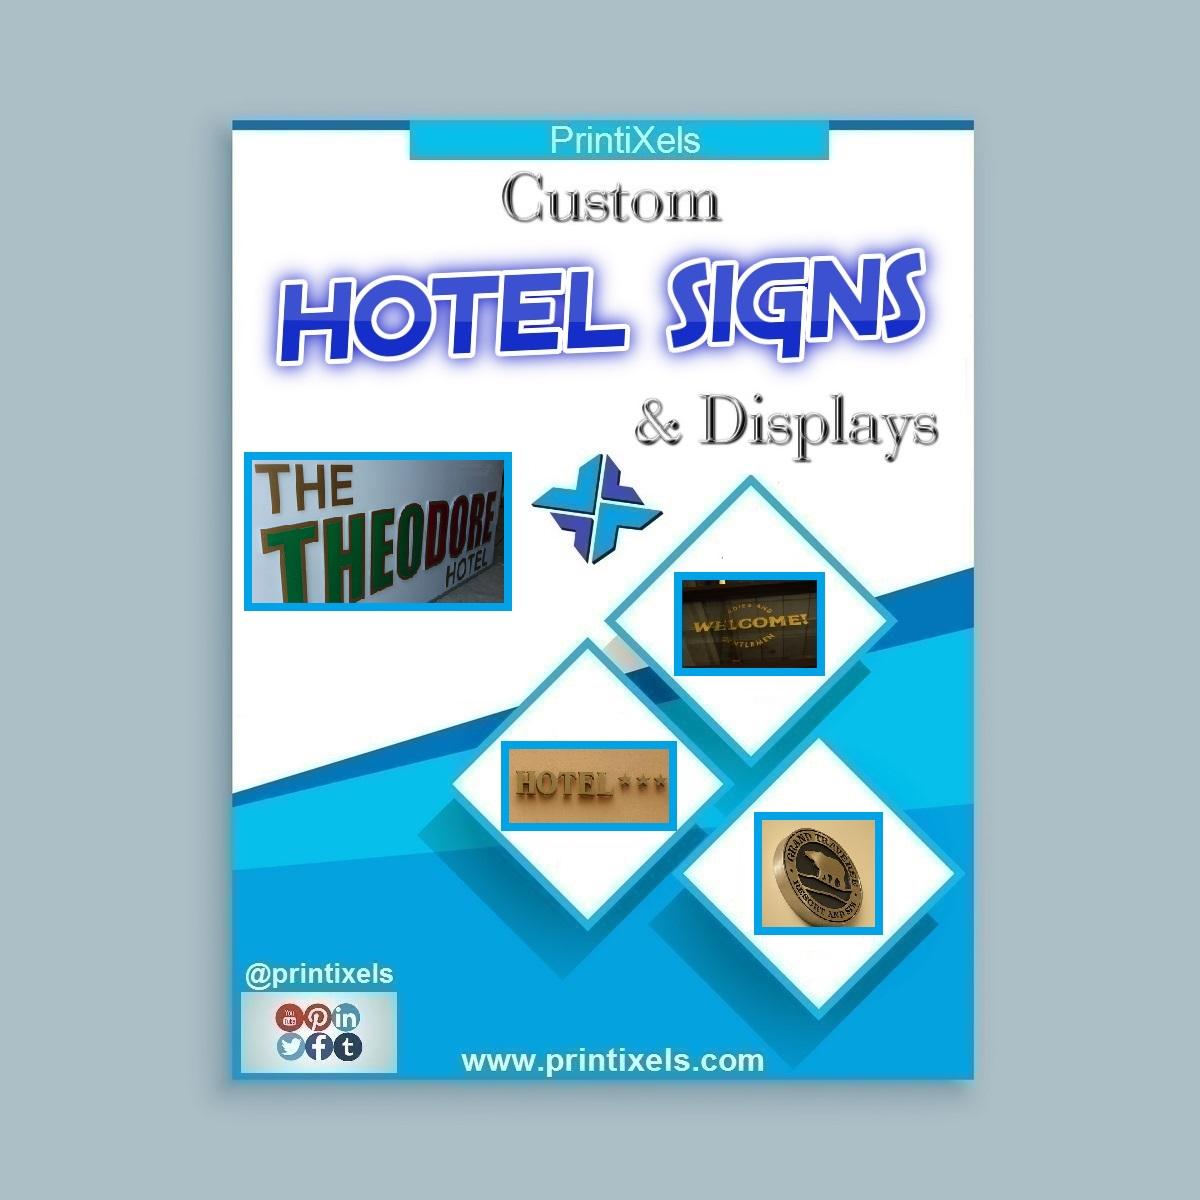 Hotel Signs Diagram Illustration Of Wiring Fluorescent Sign Custom Displays Printixels Philippines Rh Com Homans